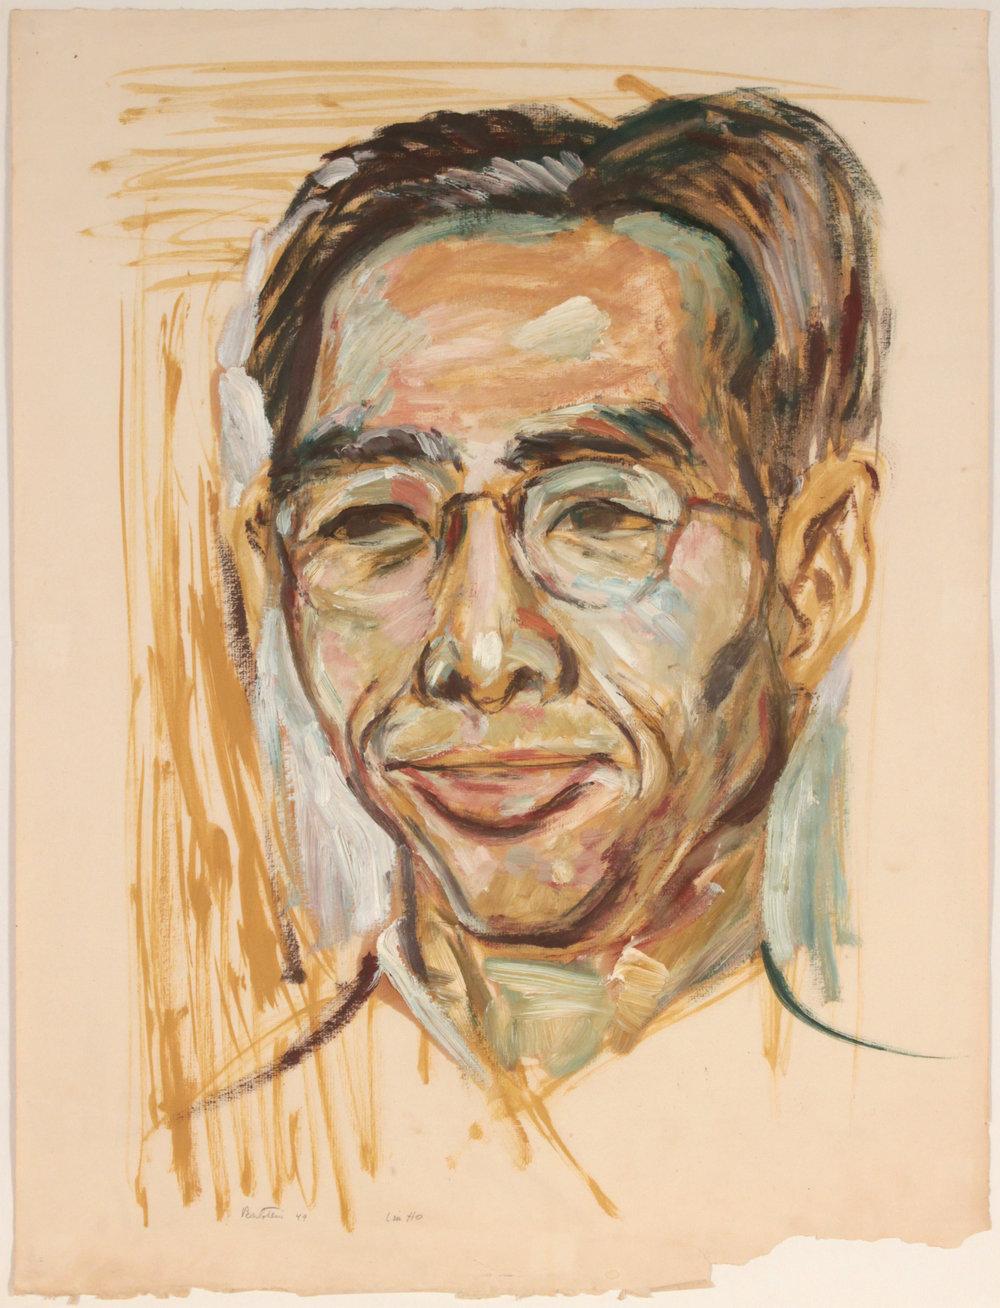 25. 1949, image 67, Lin Ho Portrait, Oil on Paper, 25 1:4x19, PPS 1406.JPG